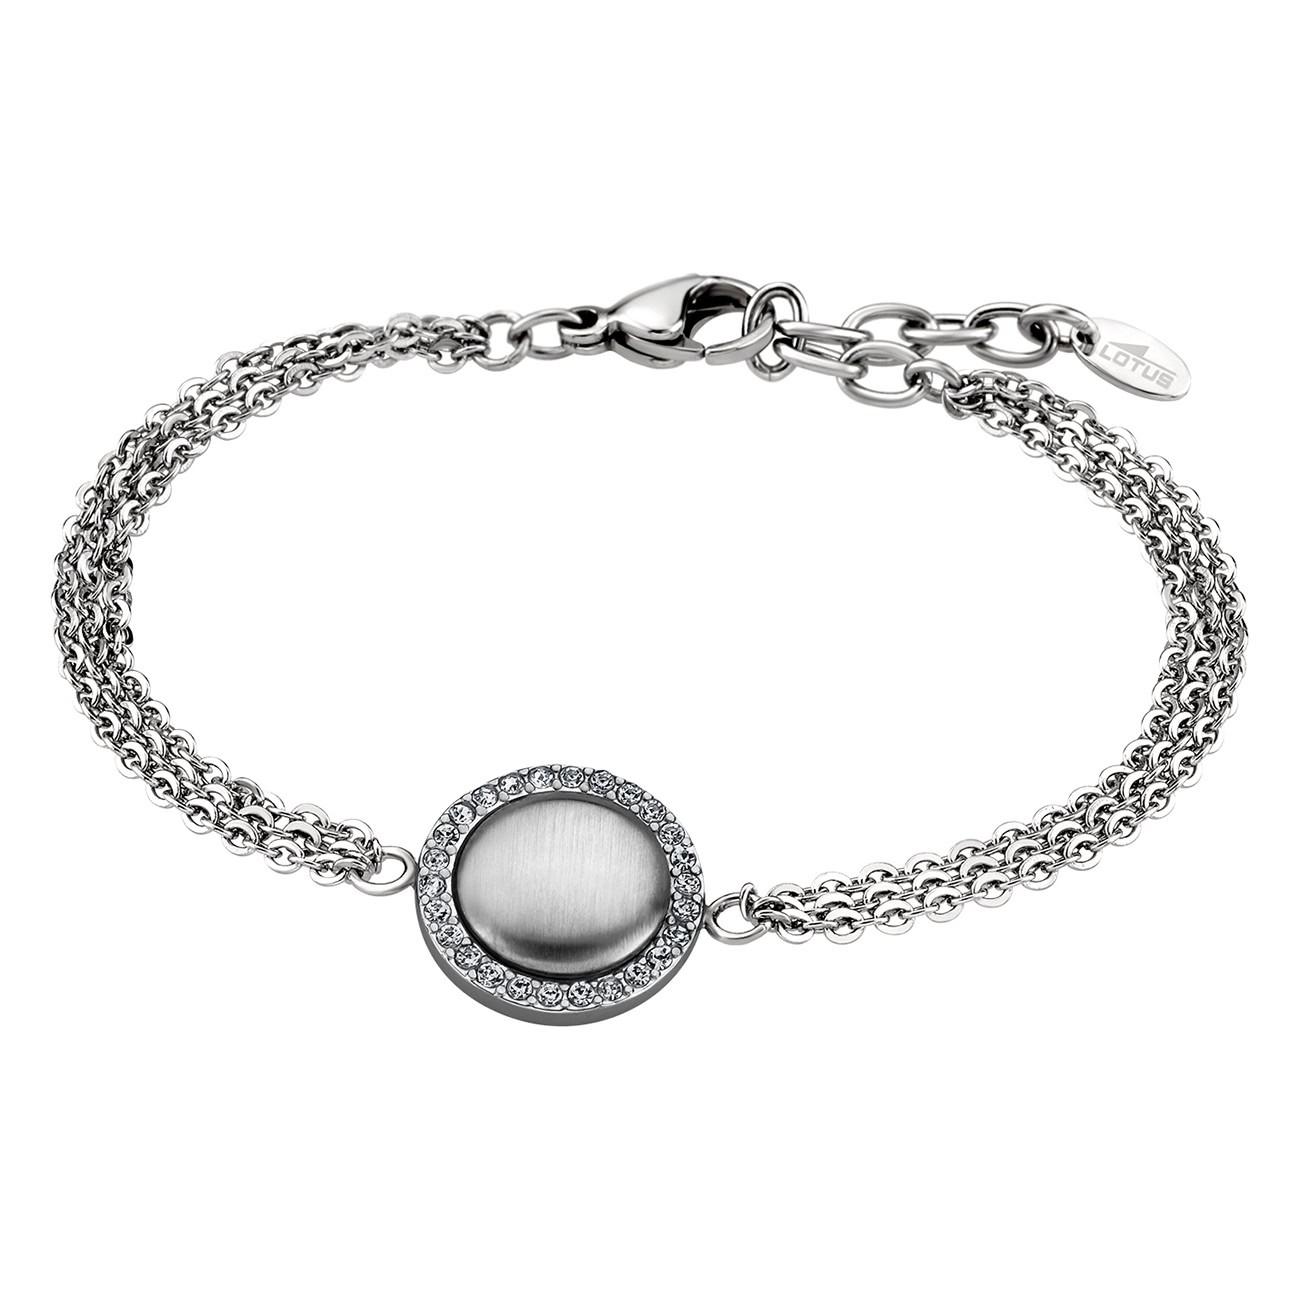 LOTUS Style Armband Damen Edelstahl Multilayer LS1775-2/1 Glitzer JLS1775-2-1